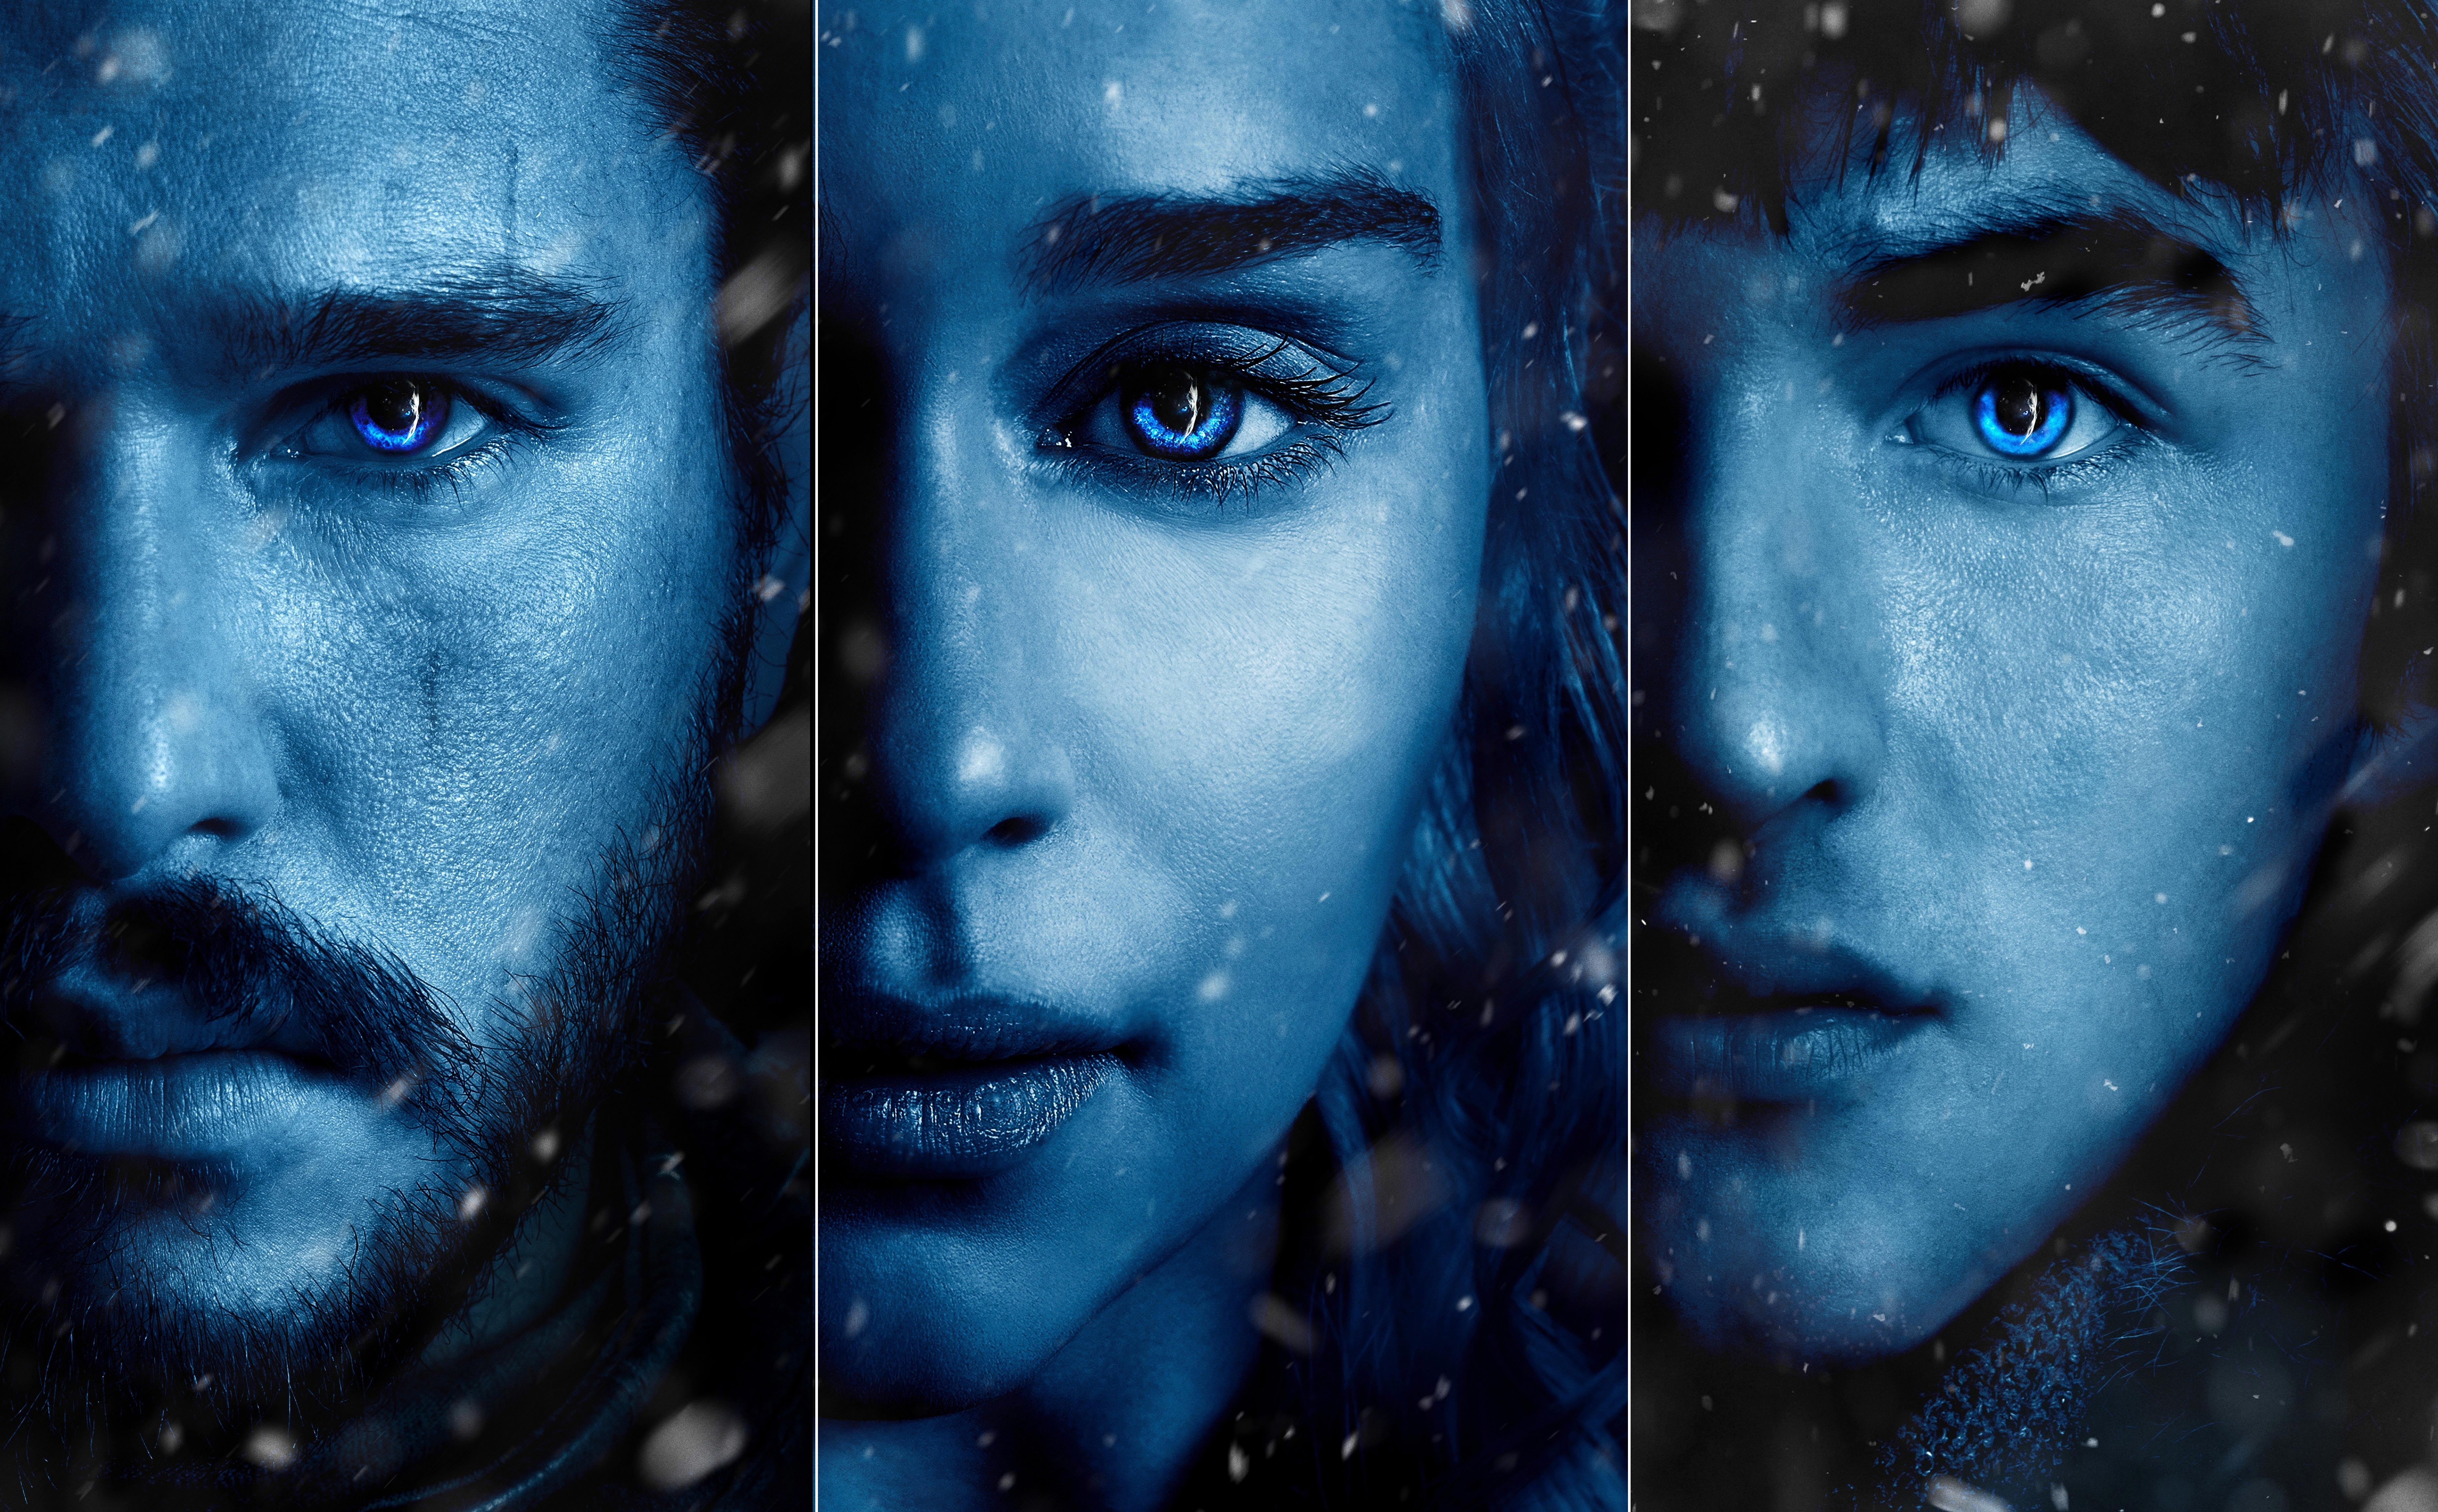 Daenerys Jon Snow Bran Stark Posters Game Of Thrones ...